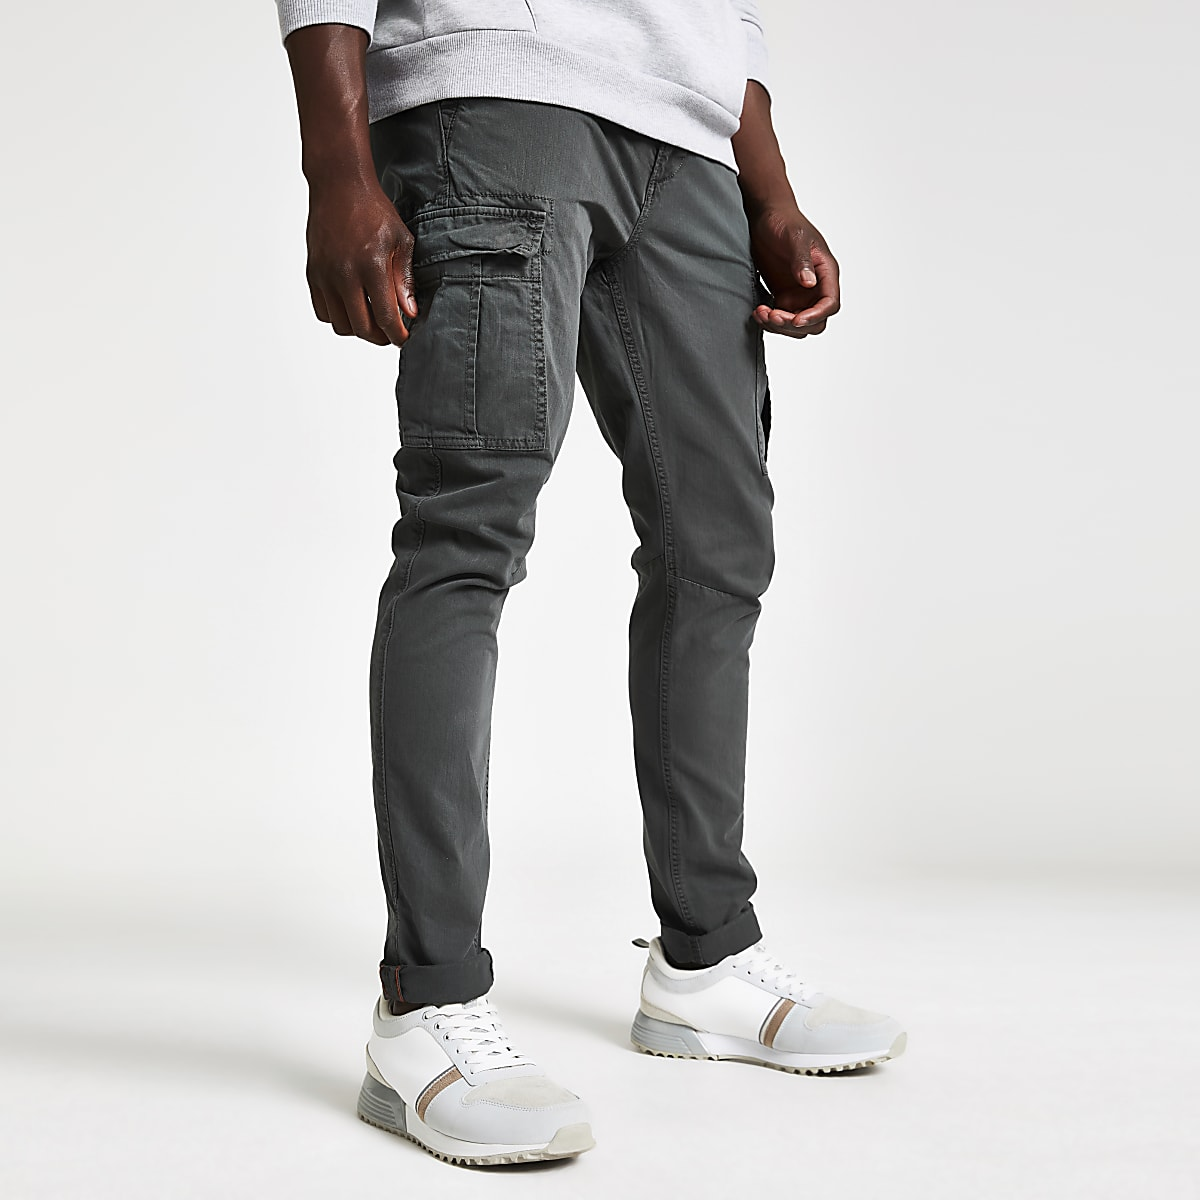 Superdry grey cargo pants